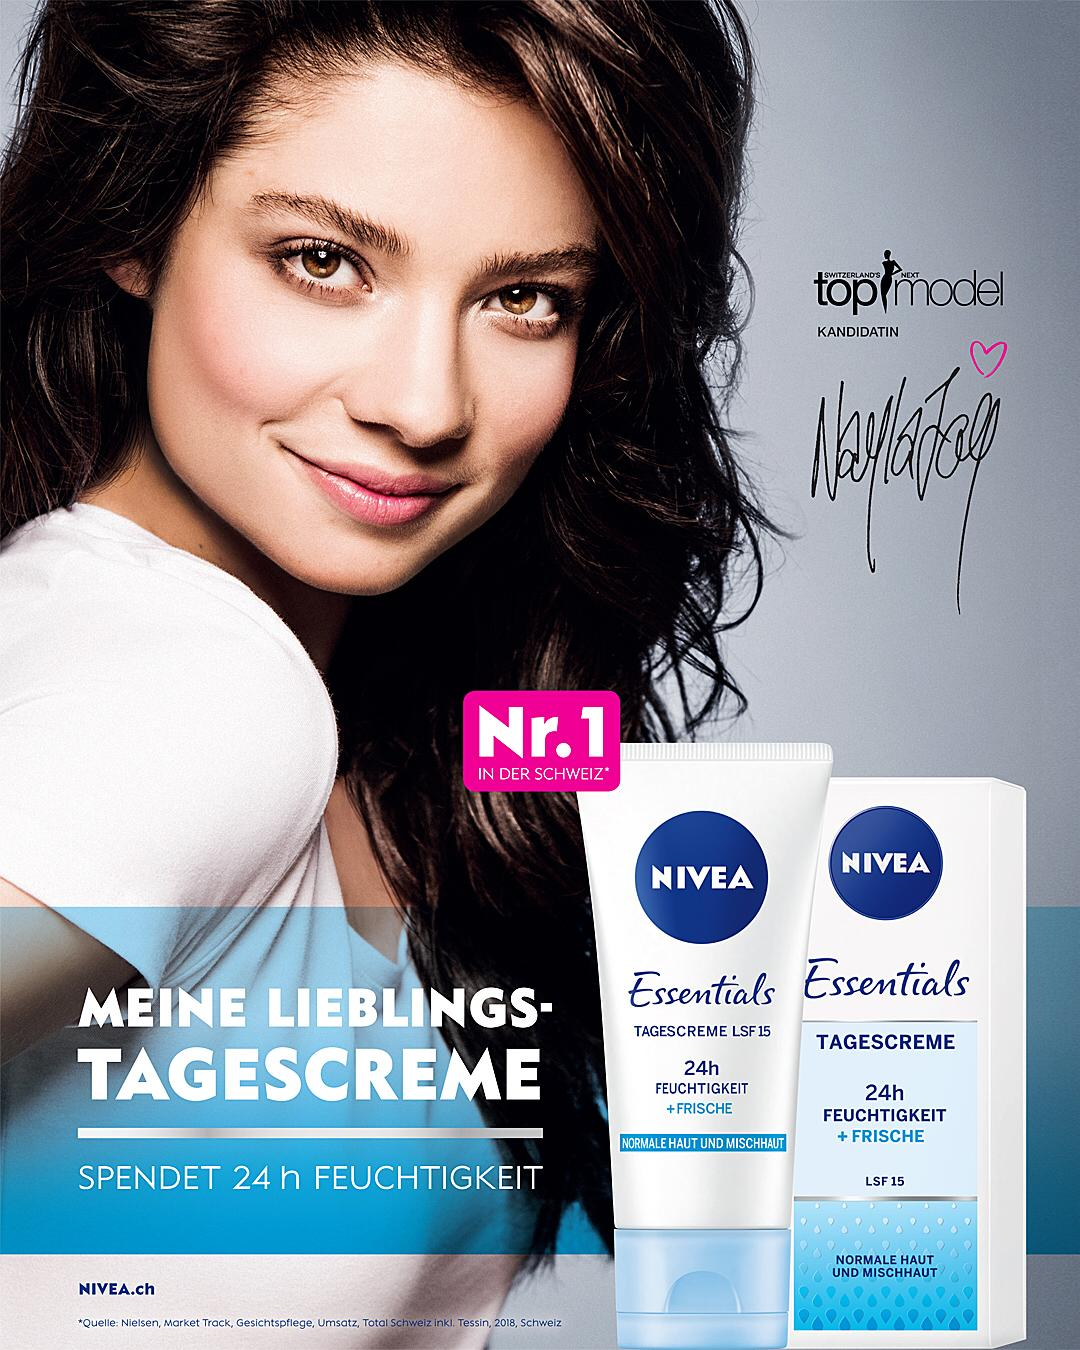 Hair, Nail, Make-up und Fashion styling portfolio / fabienne-pauli - werbung-nivea-ID612-1.jpg?v=1587043800